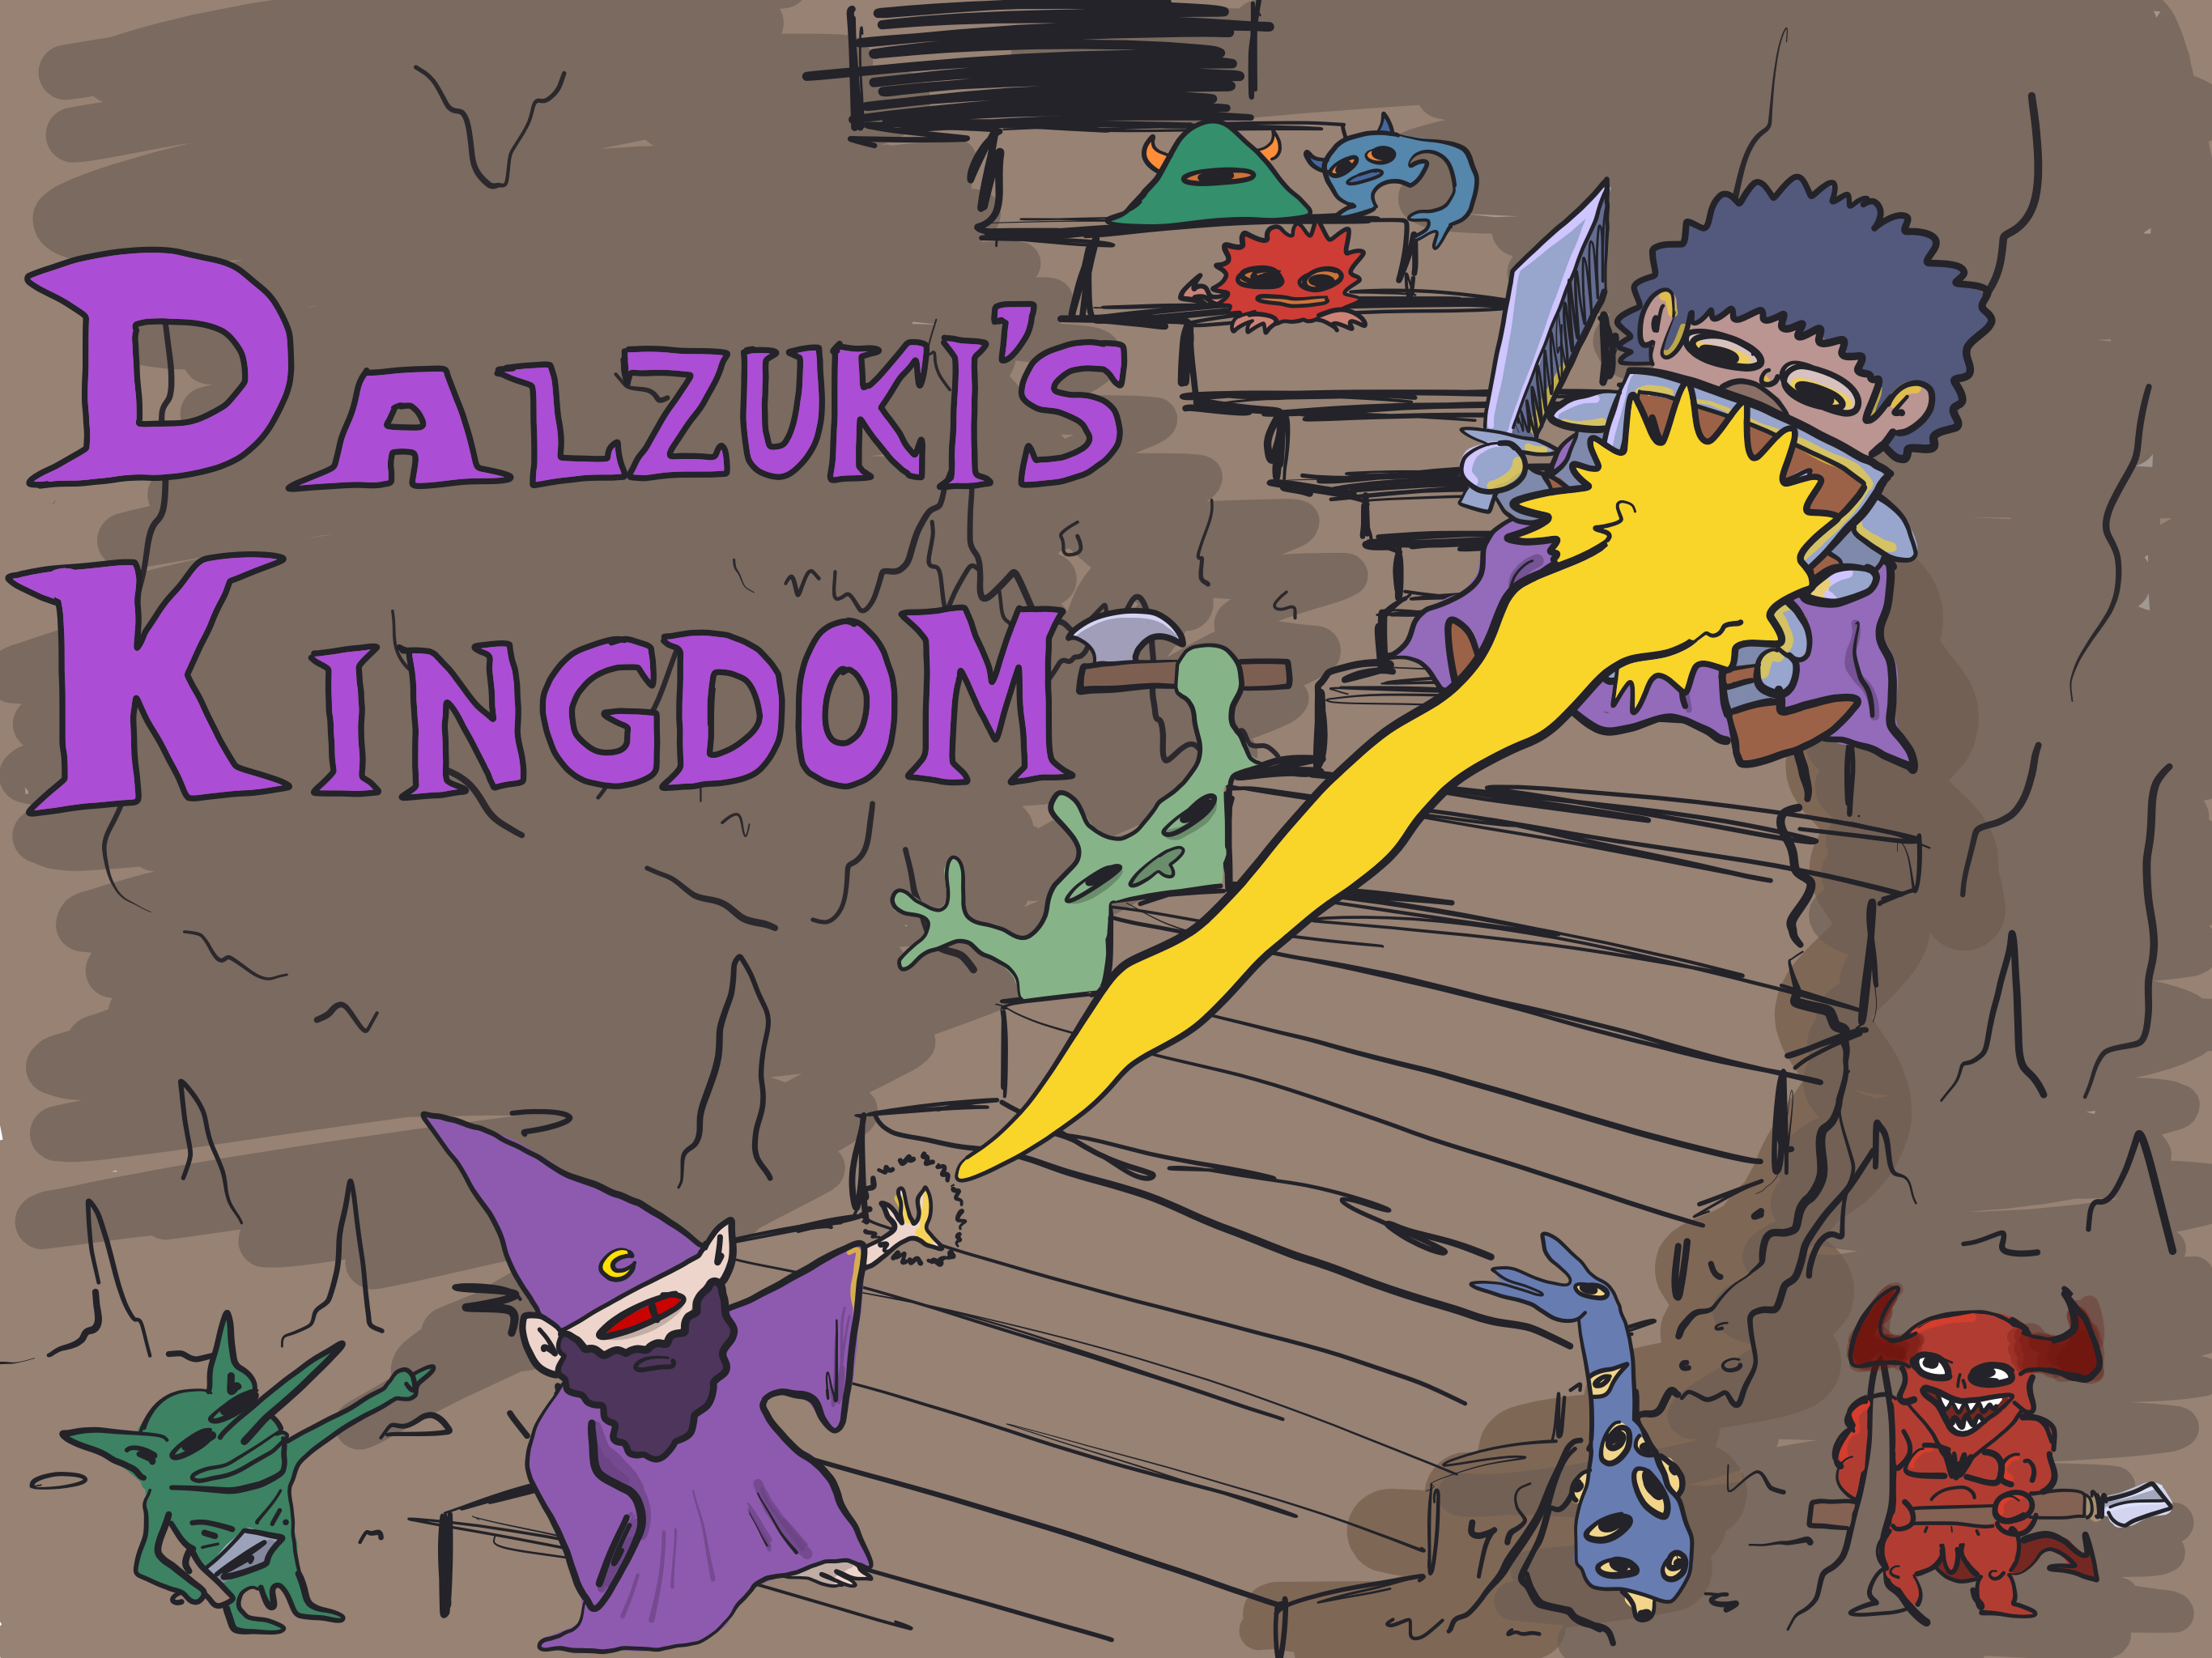 Dalzuki's Kingdom